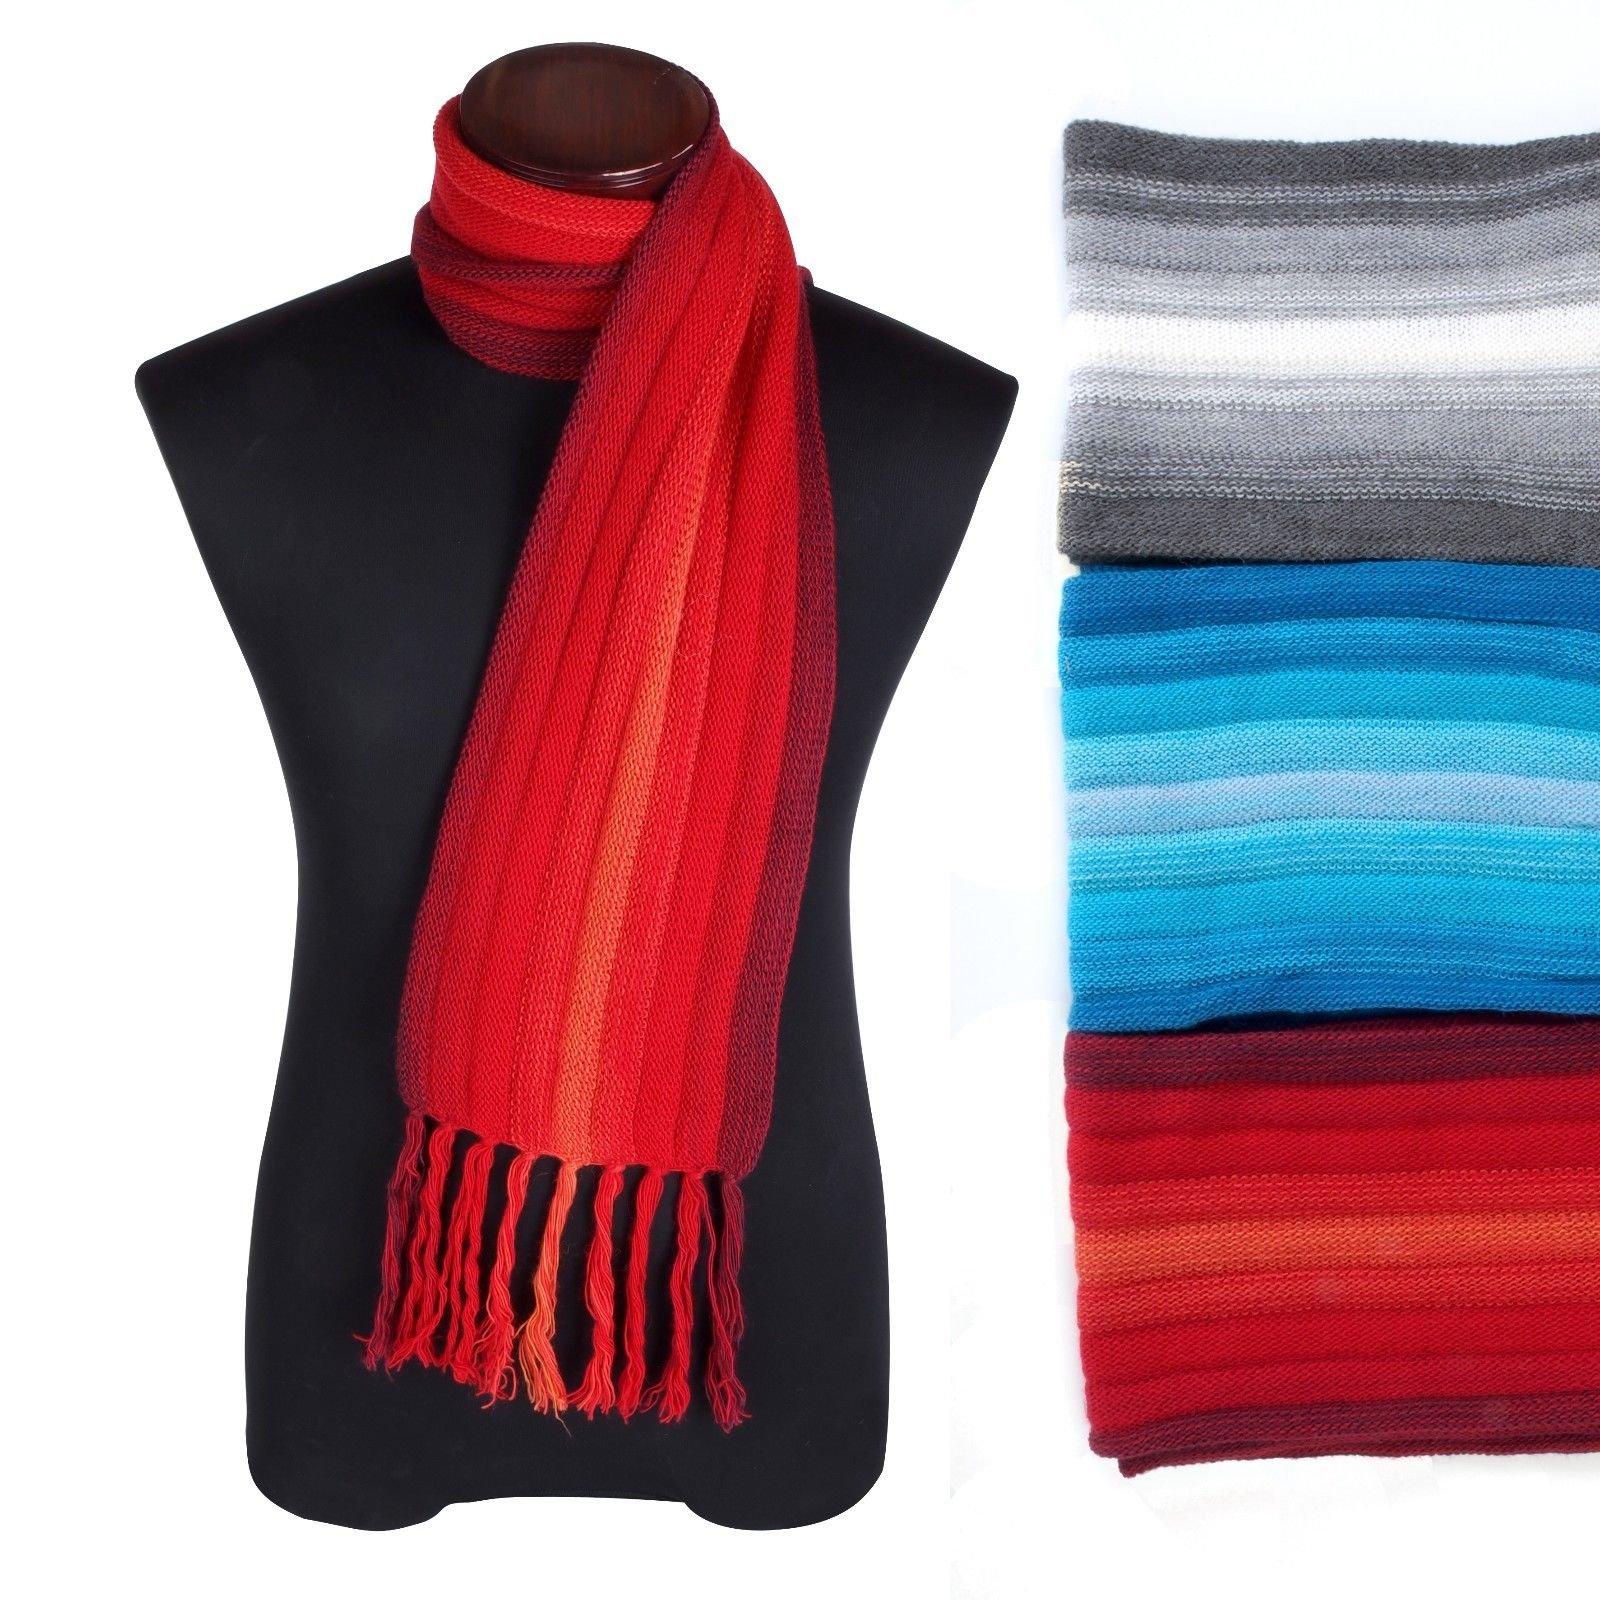 #4405 Alpaca Scarf Three Pack Wholesale Assortment Artisan Knit Peru Designer